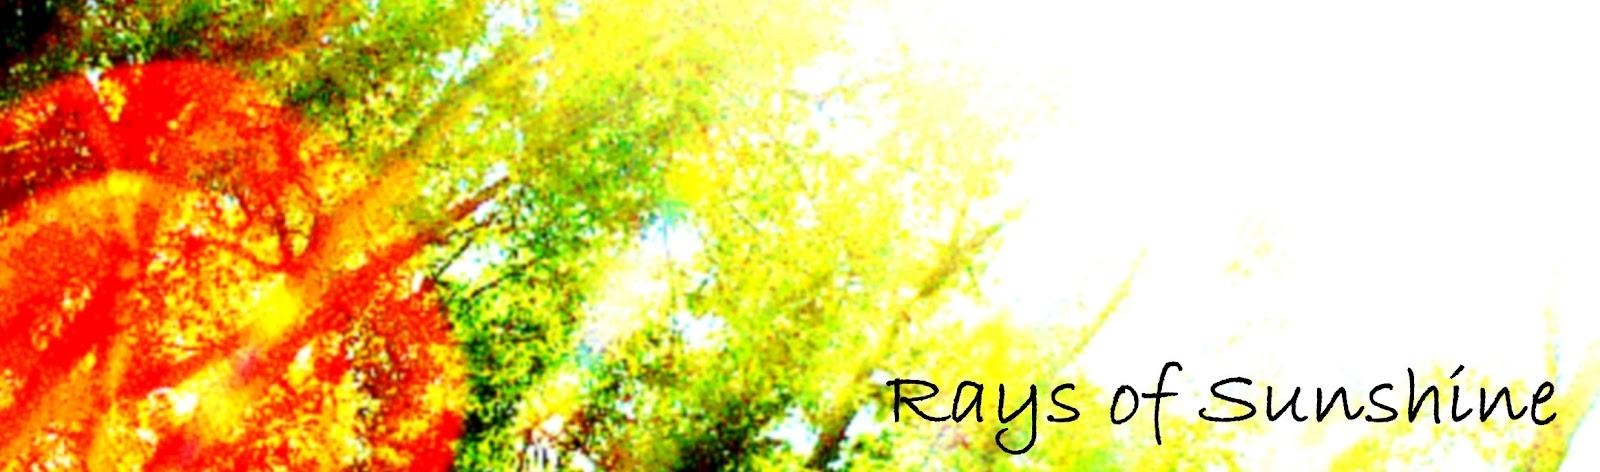 Circles Of Sunshine: Rays of Sunshine-Meet Kim